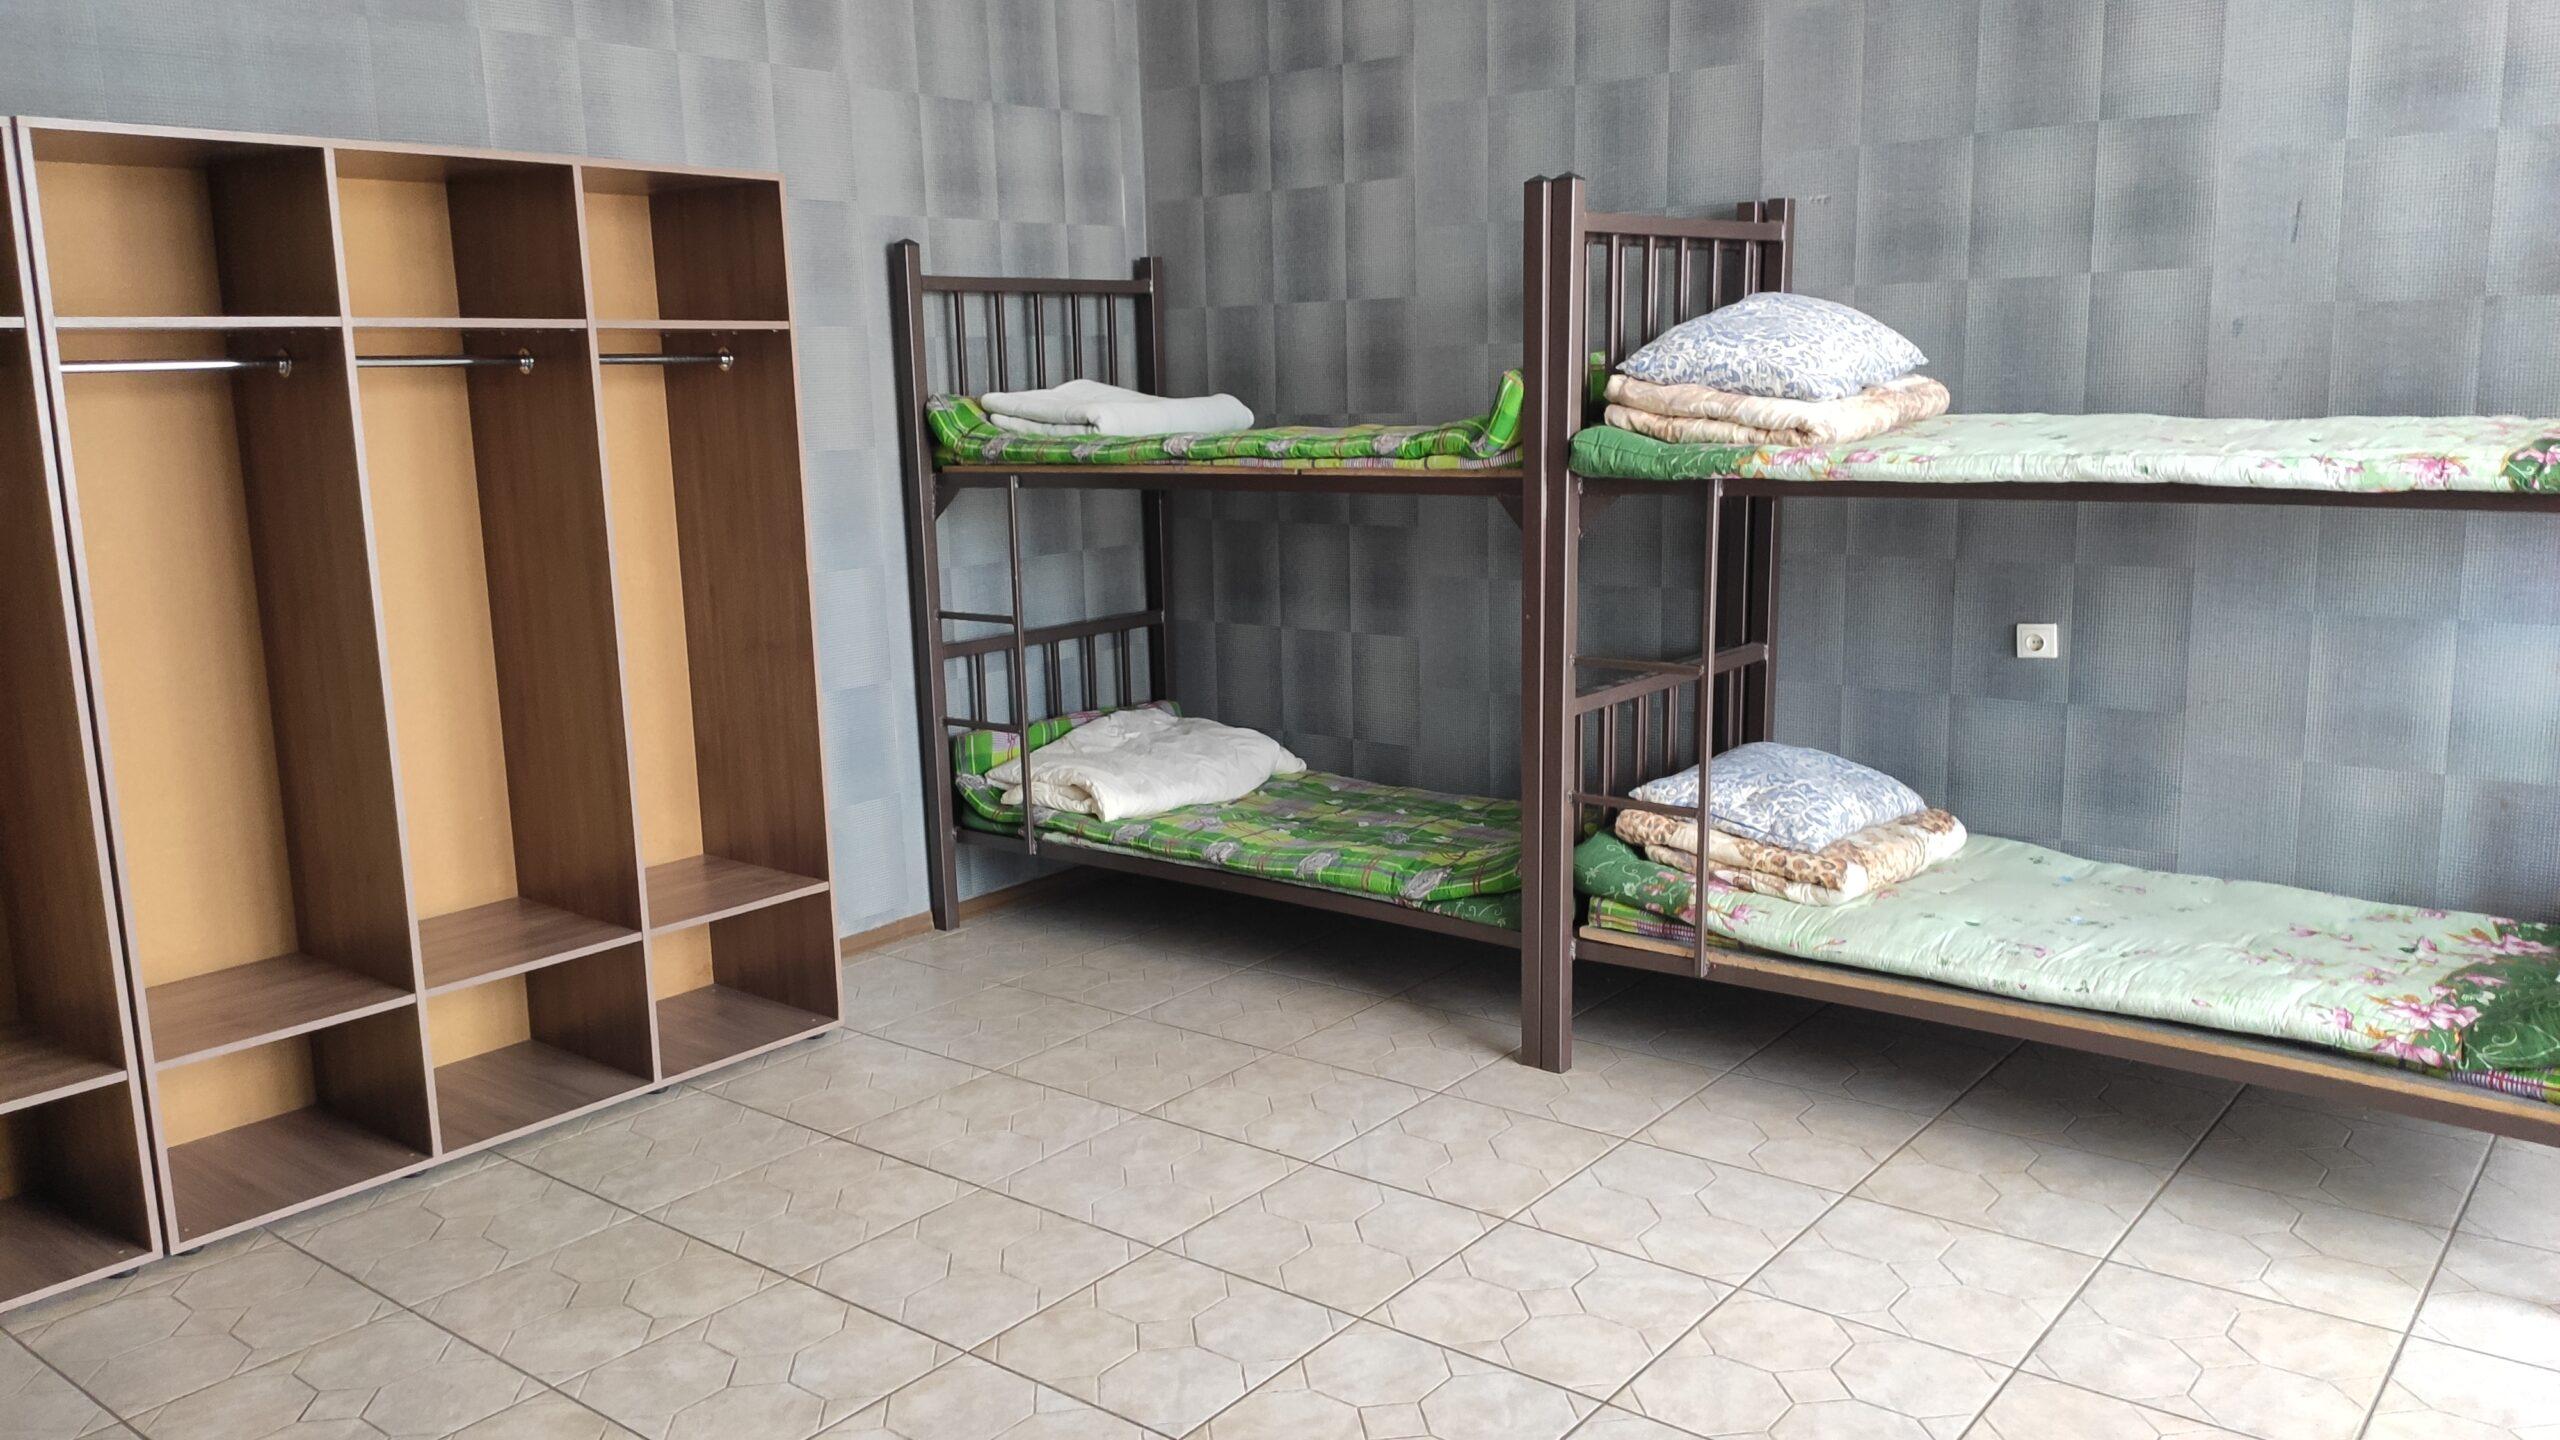 Хостел Запорожье Анголенко   Номера от 130 грн   Hostel Европа